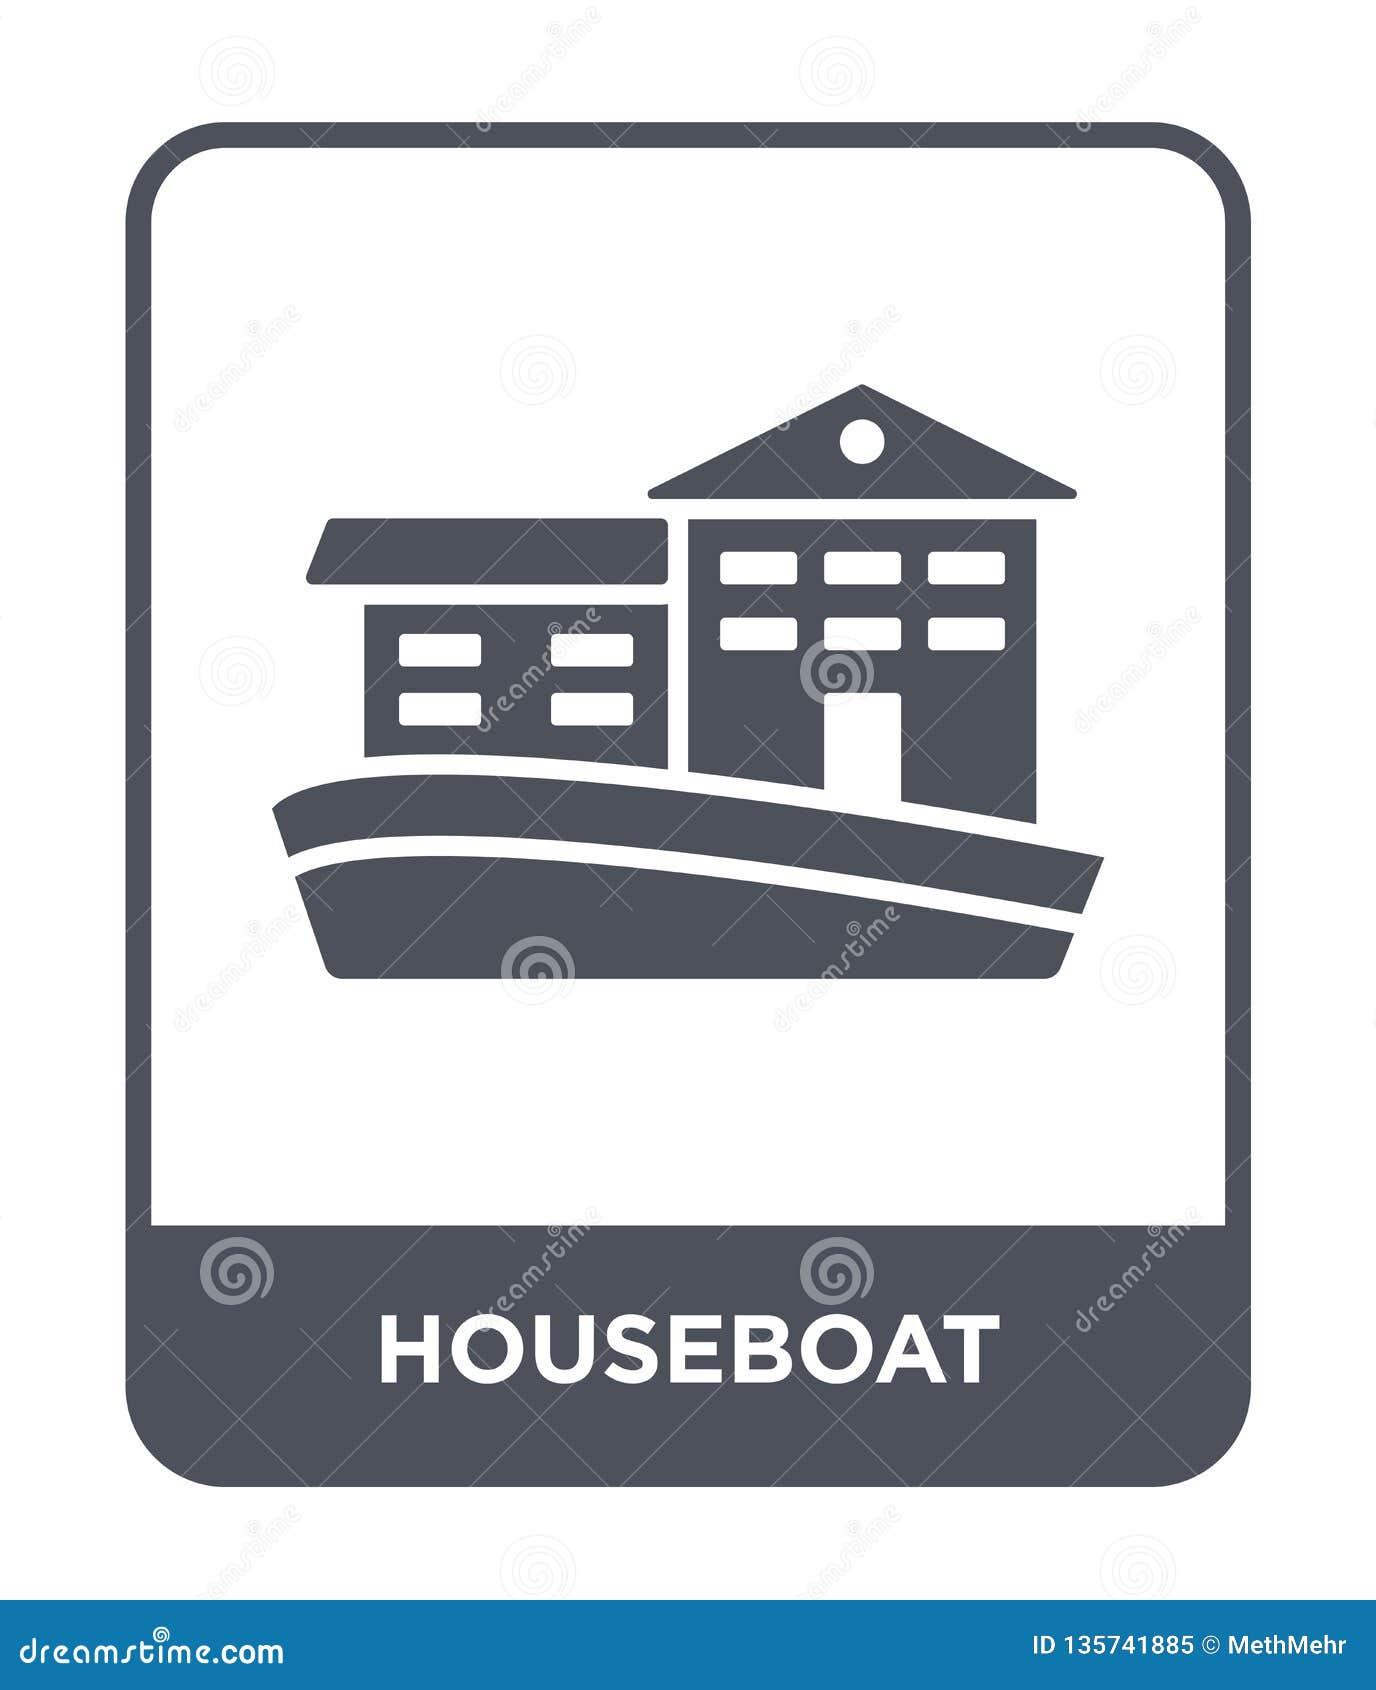 Icono de la casa flotante en estilo de moda del diseño icono de la casa flotante aislado en el fondo blanco plano simple y modern